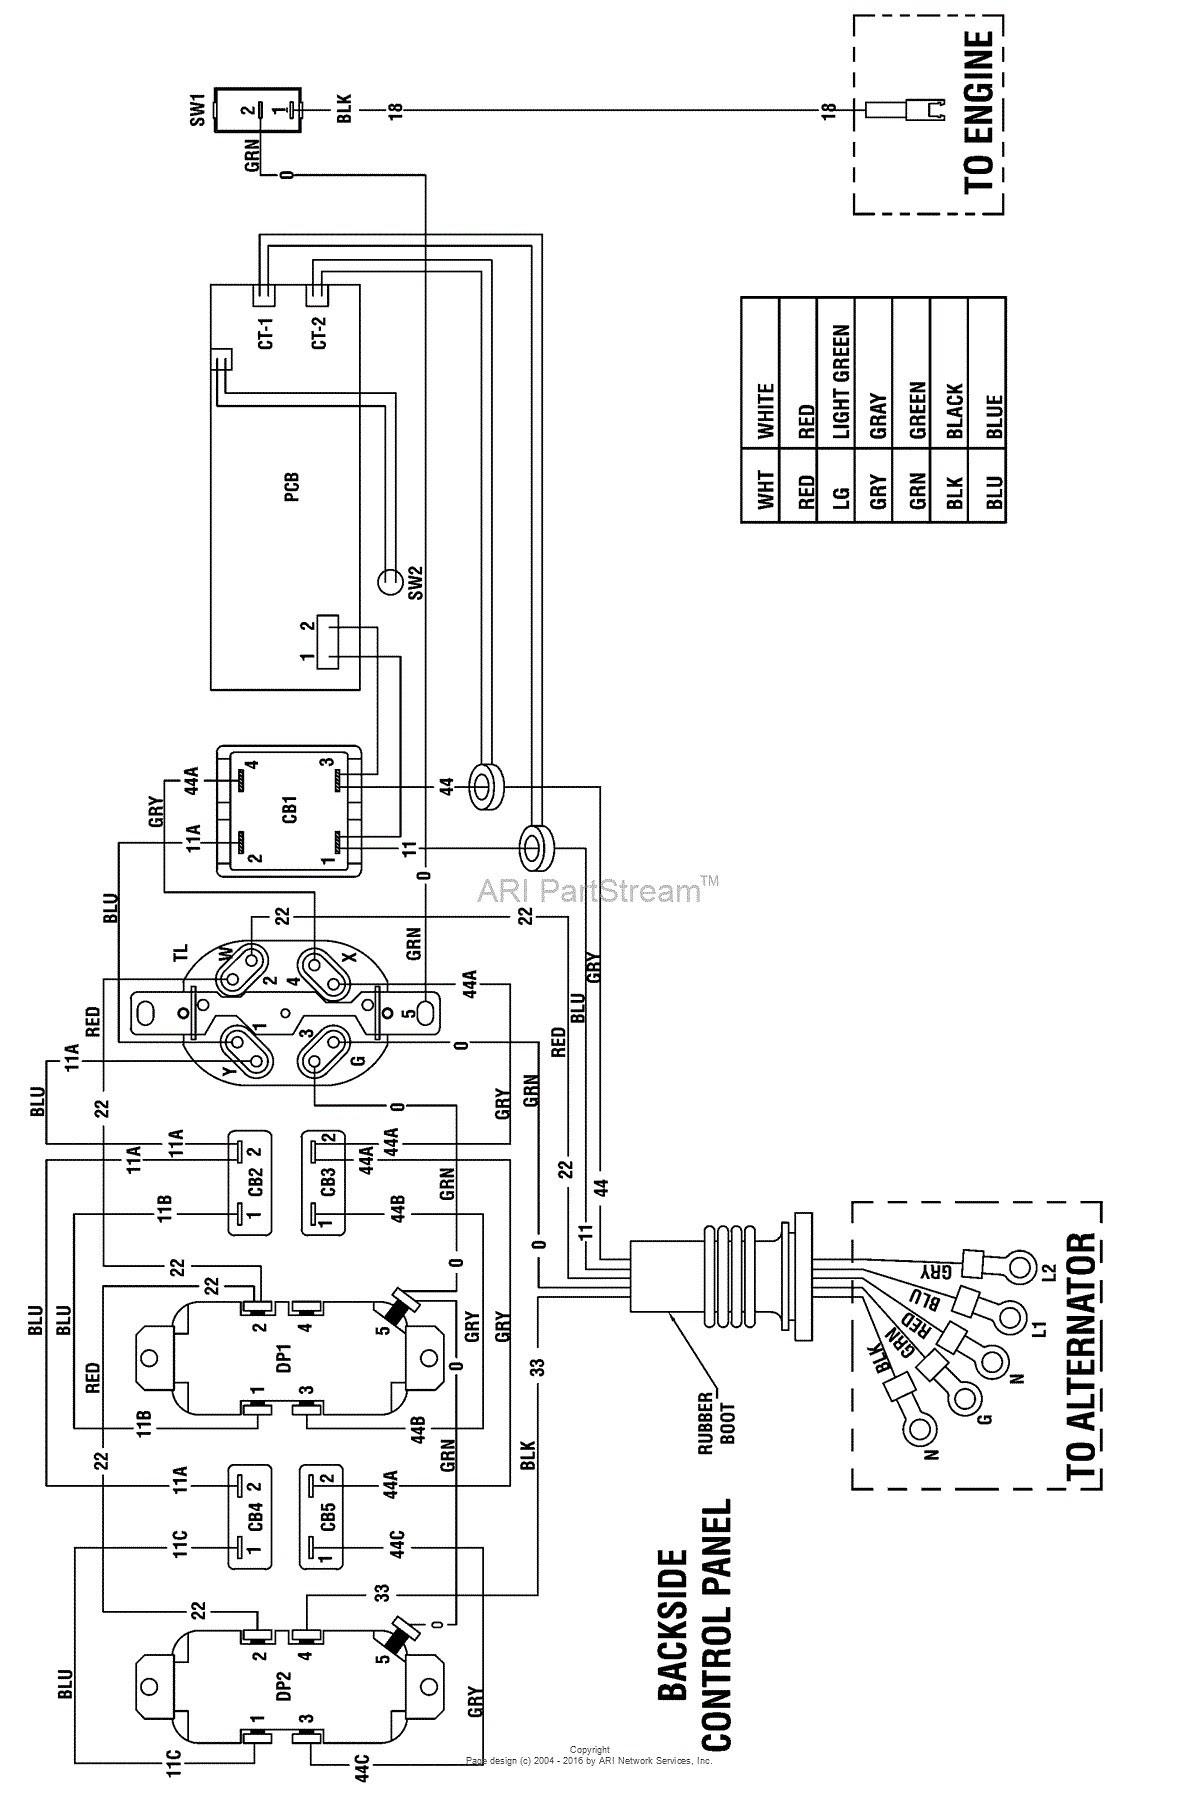 18 Hp Vanguard Wiring Diagram Golf 1 Alternator Wiring Diagram Mazda3 Sp23 Yenpancane Jeanjaures37 Fr